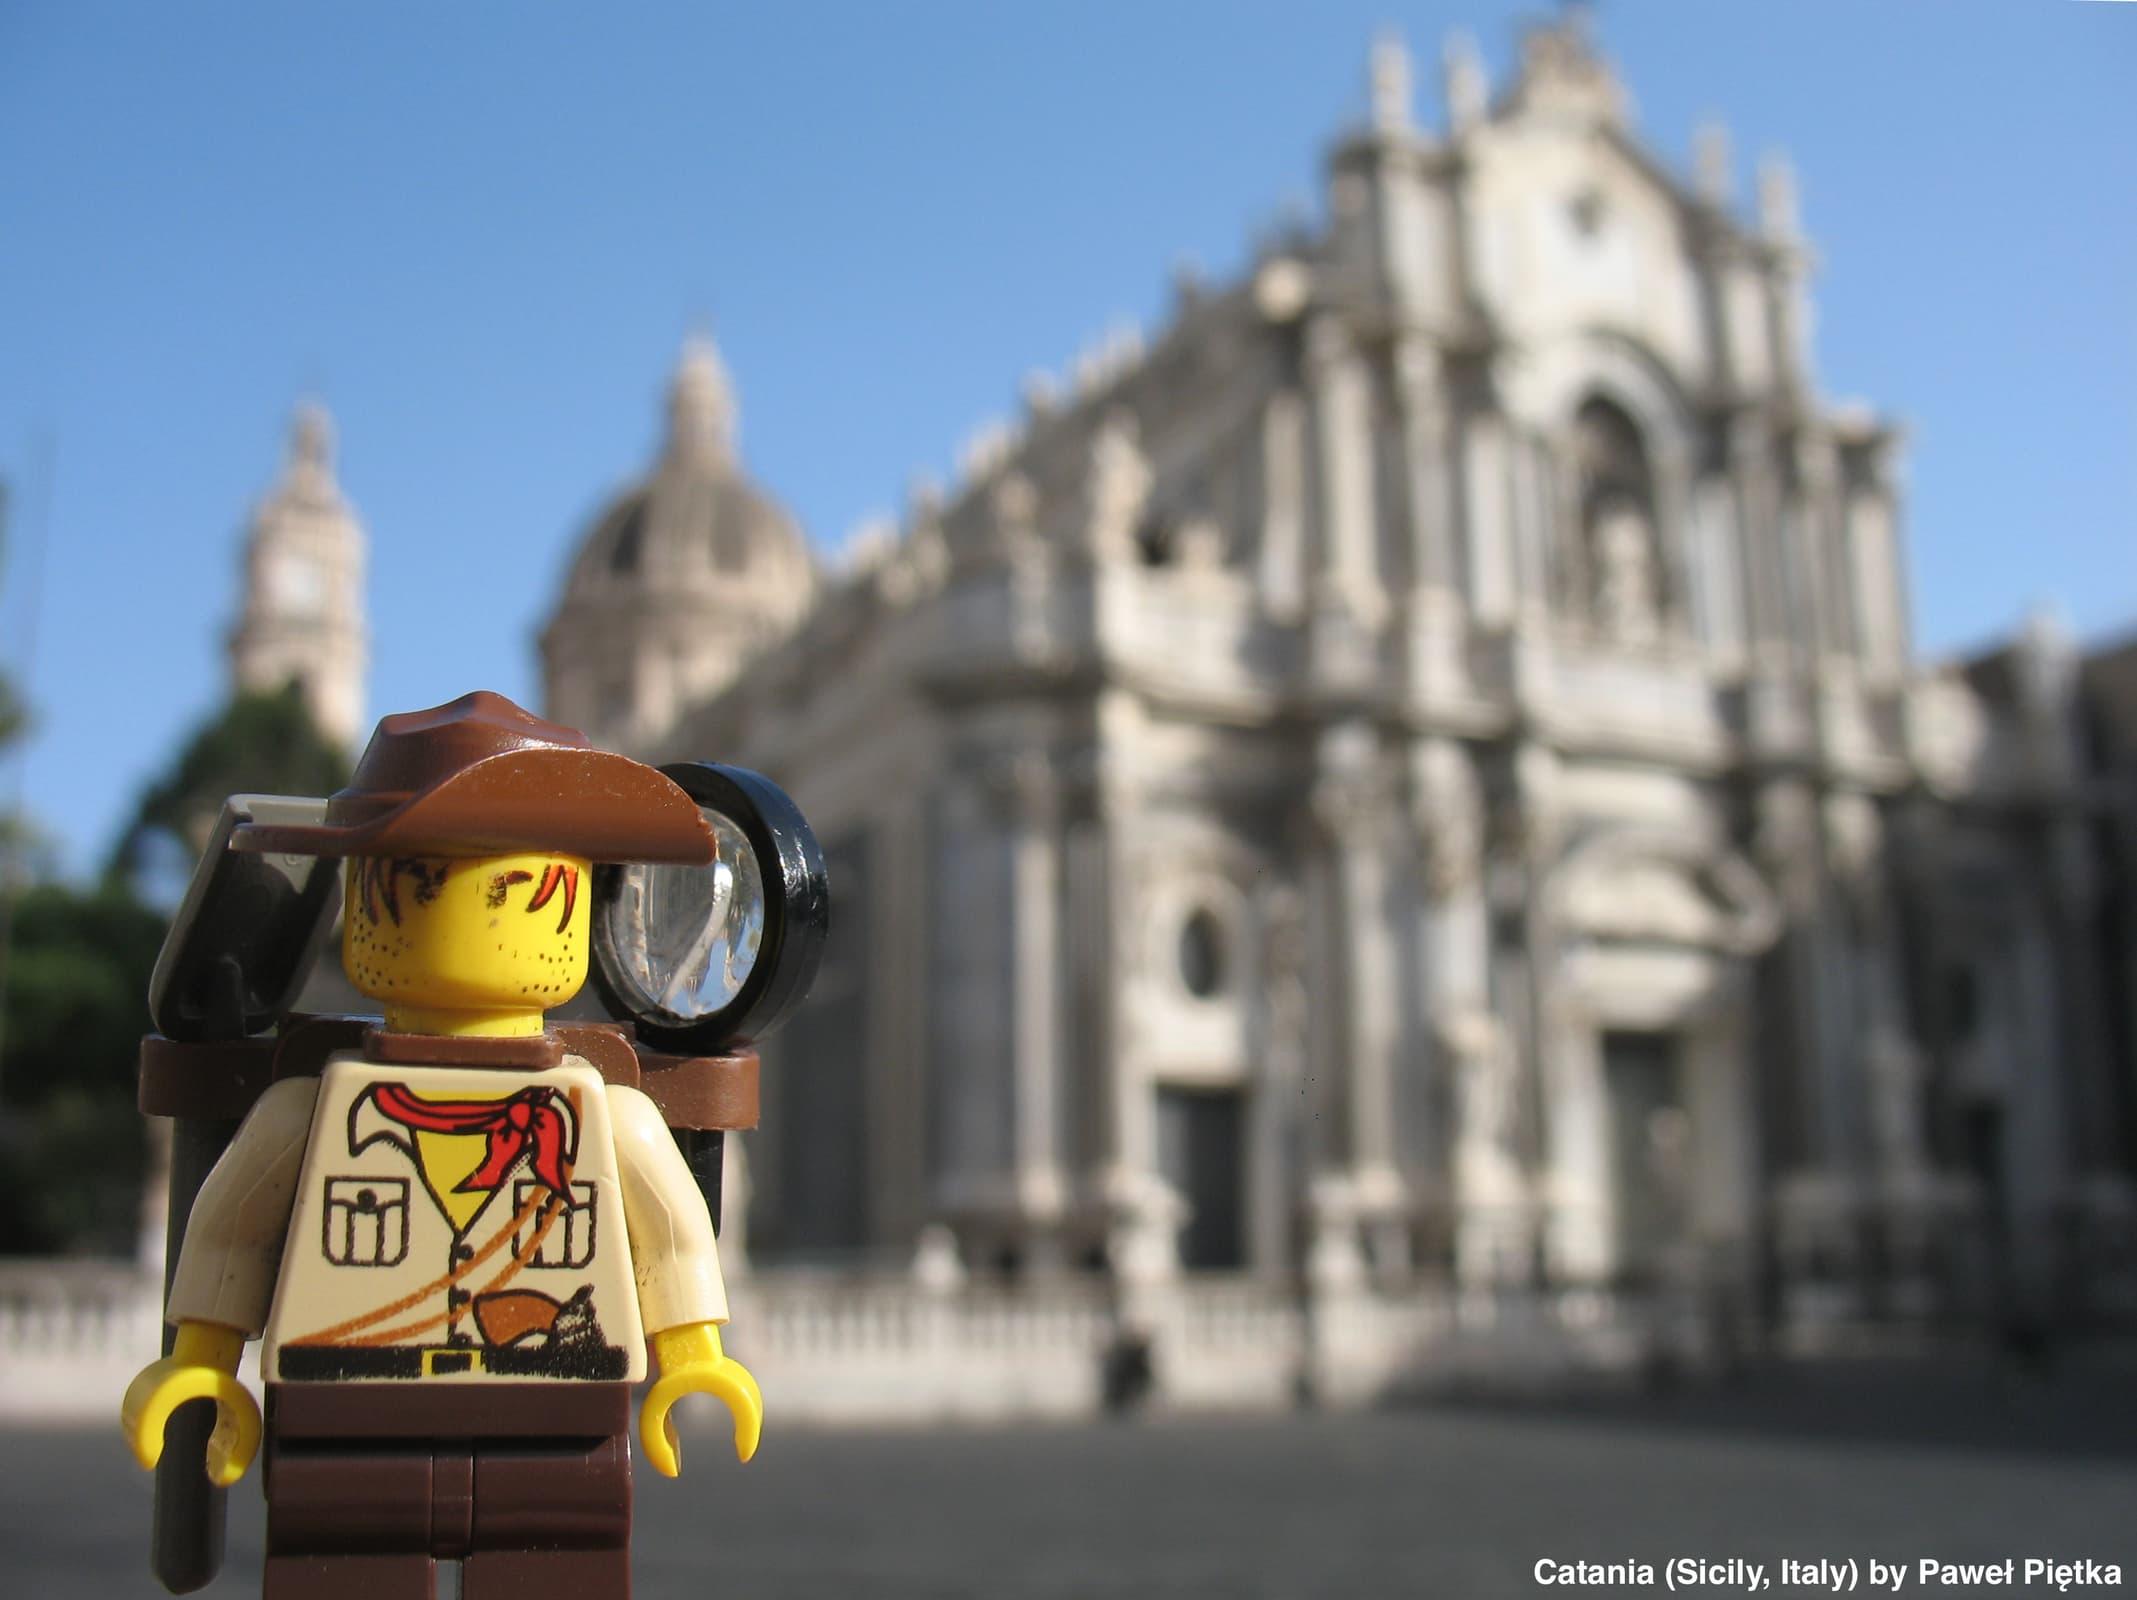 Catania (Sicily, Italy) - Duomo Cathedral St Agatha